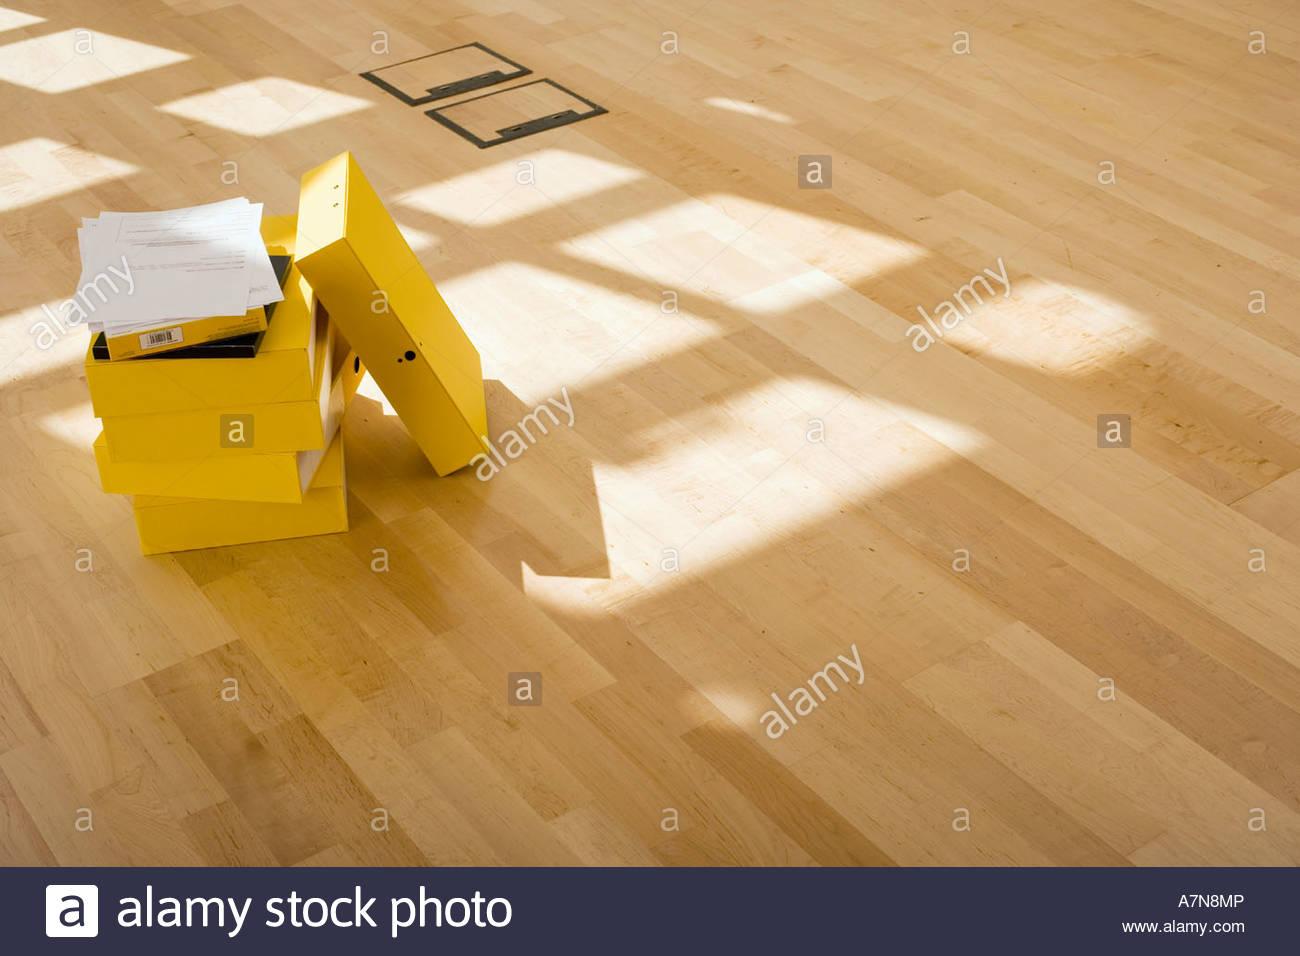 Documents on stack of yellow folders on office floor sunlight shining through window - Stock Image